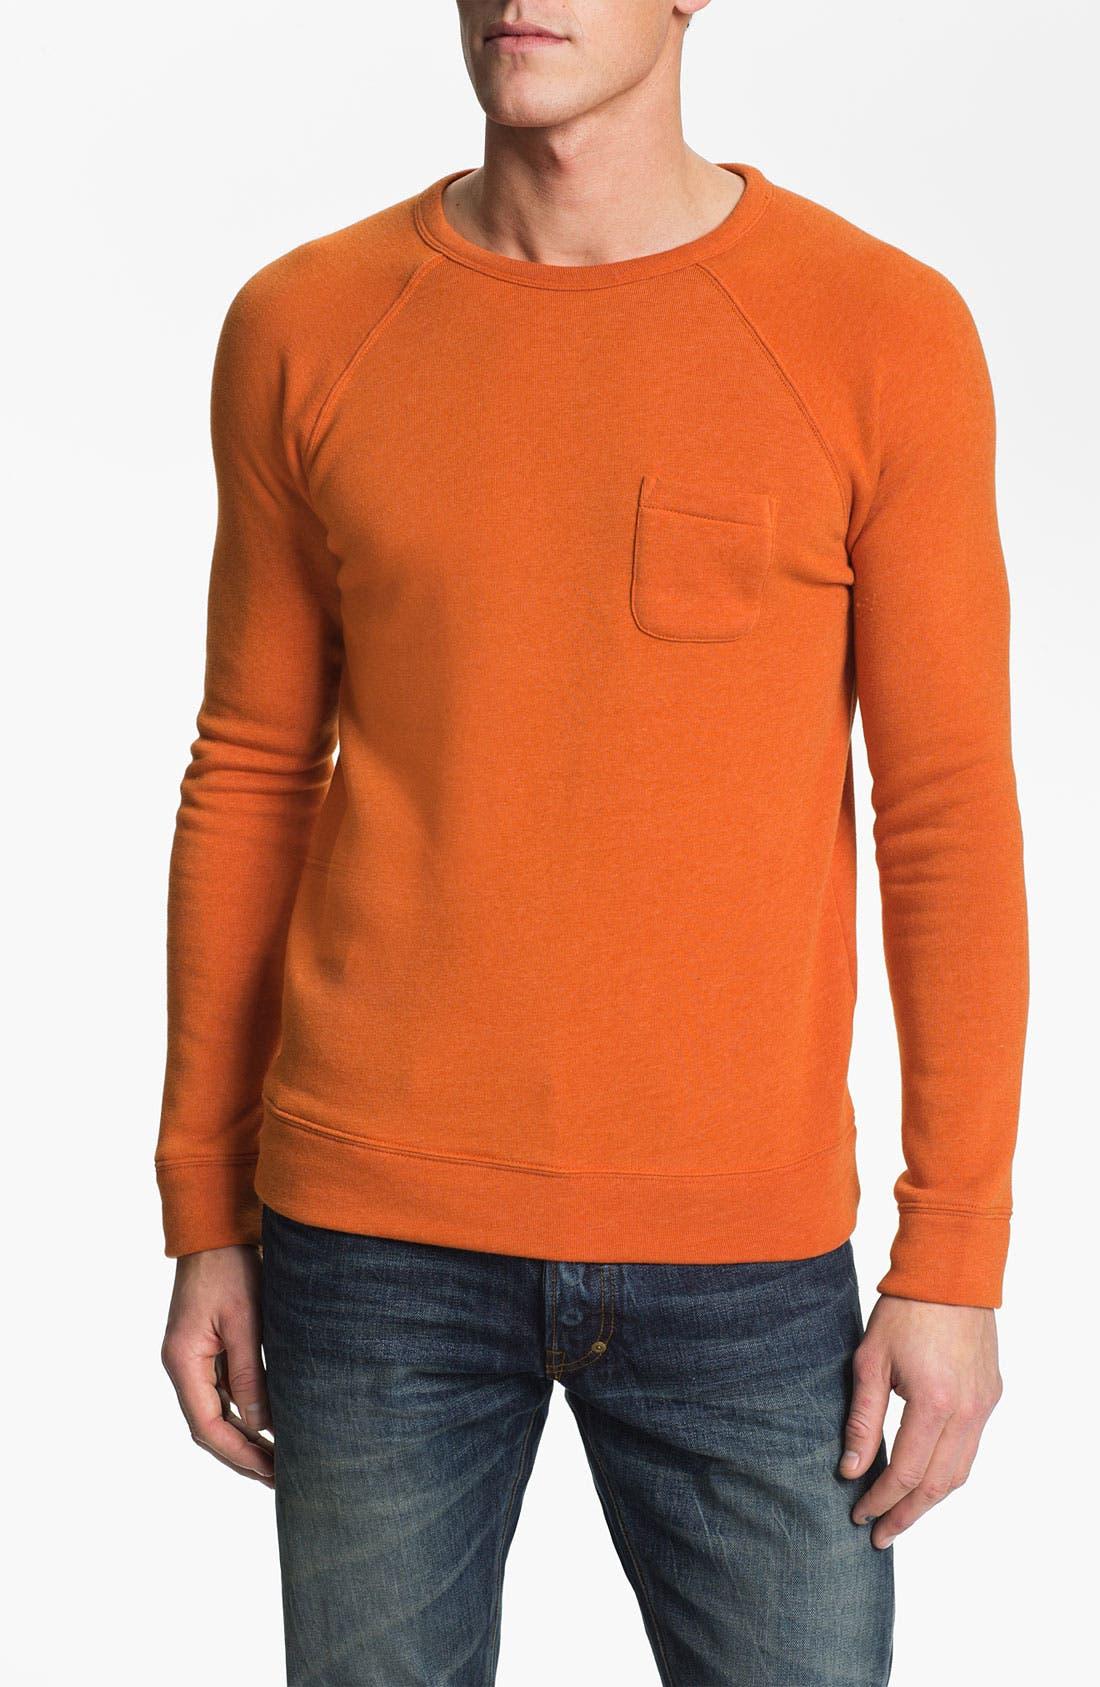 Main Image - Obey Lofty Creature Comforts Crewneck Sweatshirt